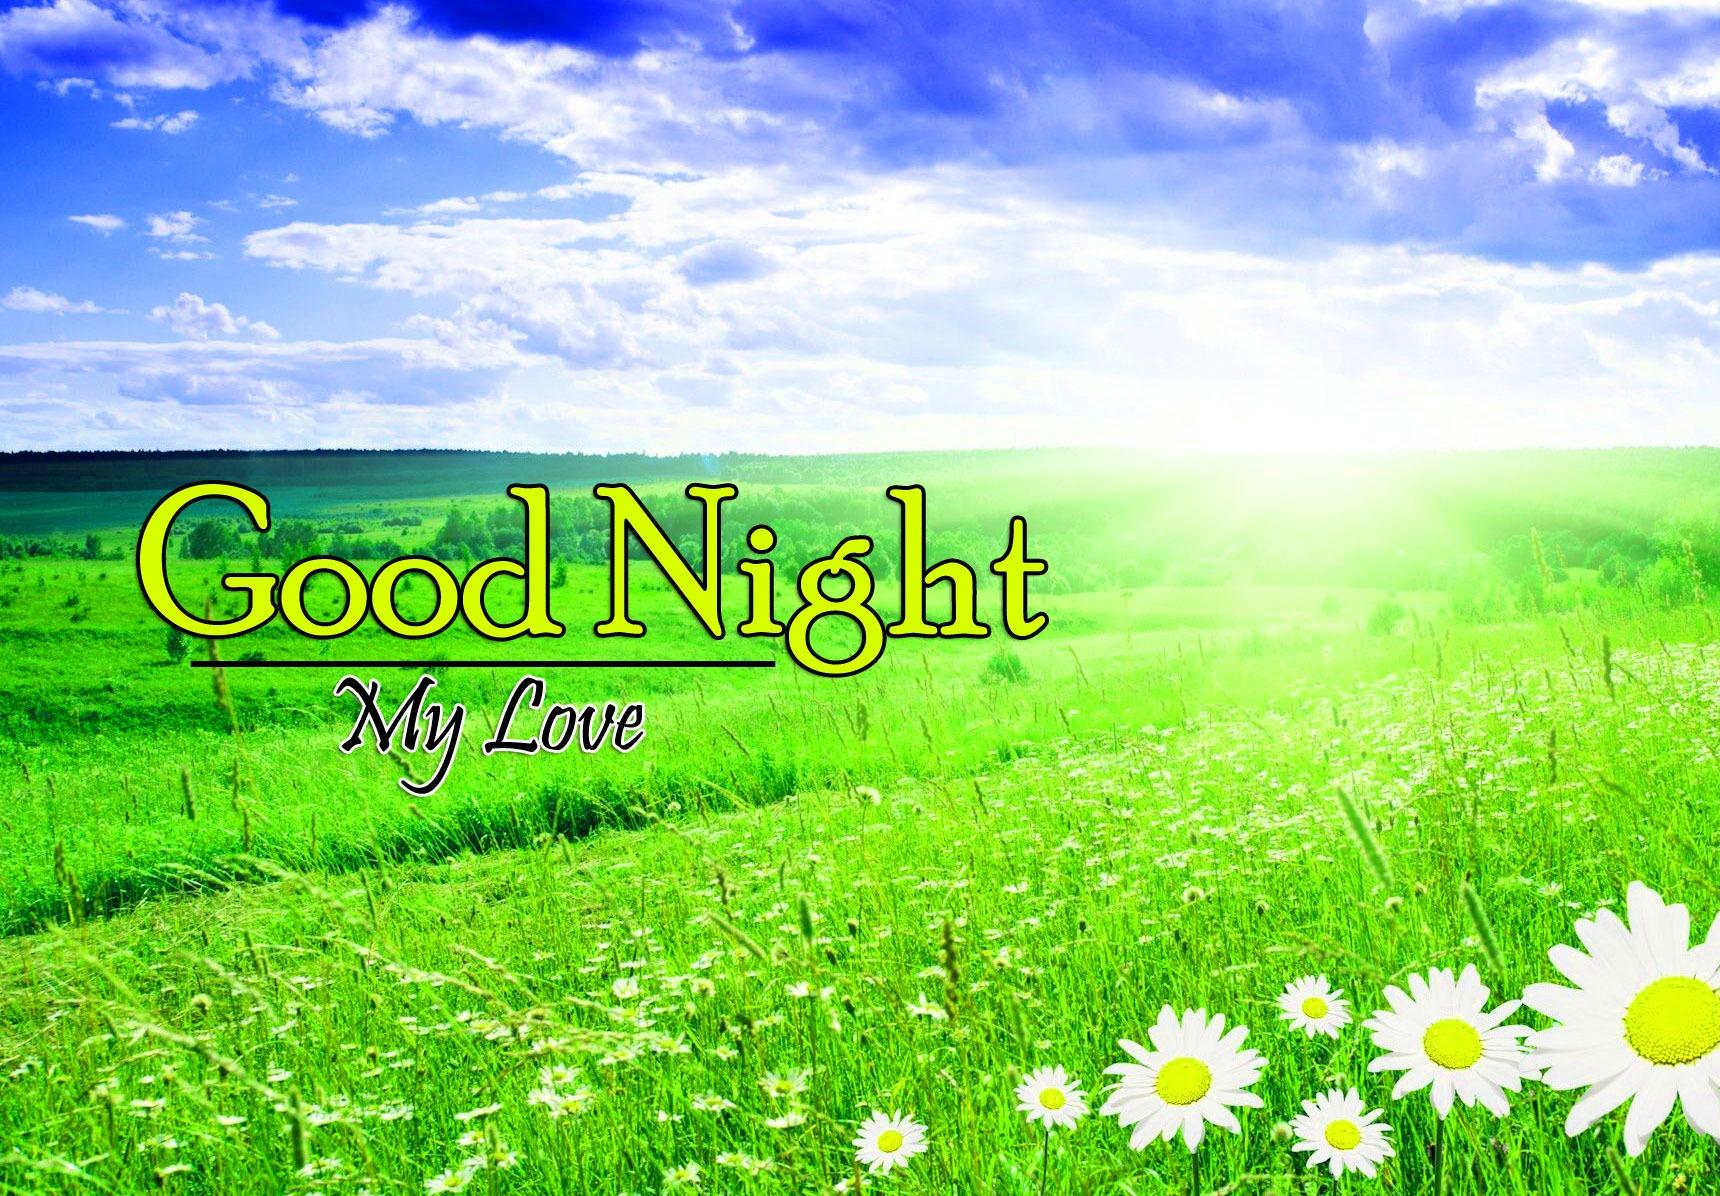 New Good Night Wallpaper free